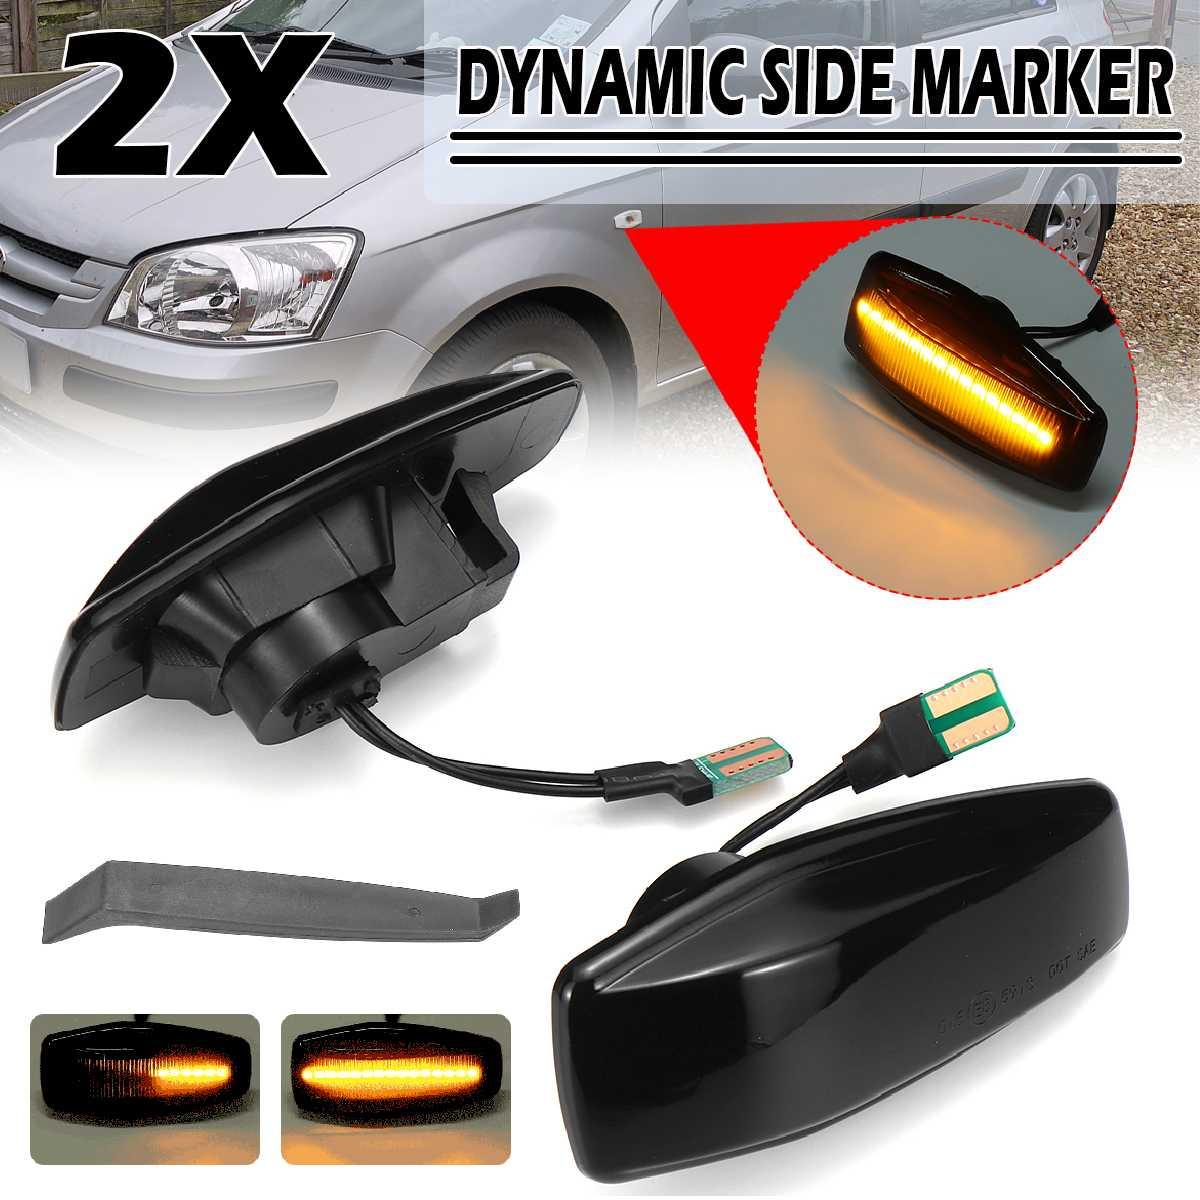 2pcs Flowing Turn Signal Led Side Marker Light 12V Panel Lamp Side Lamp Dynamic Indicator Blinker For Hyundai I10 TRAJET GETZ